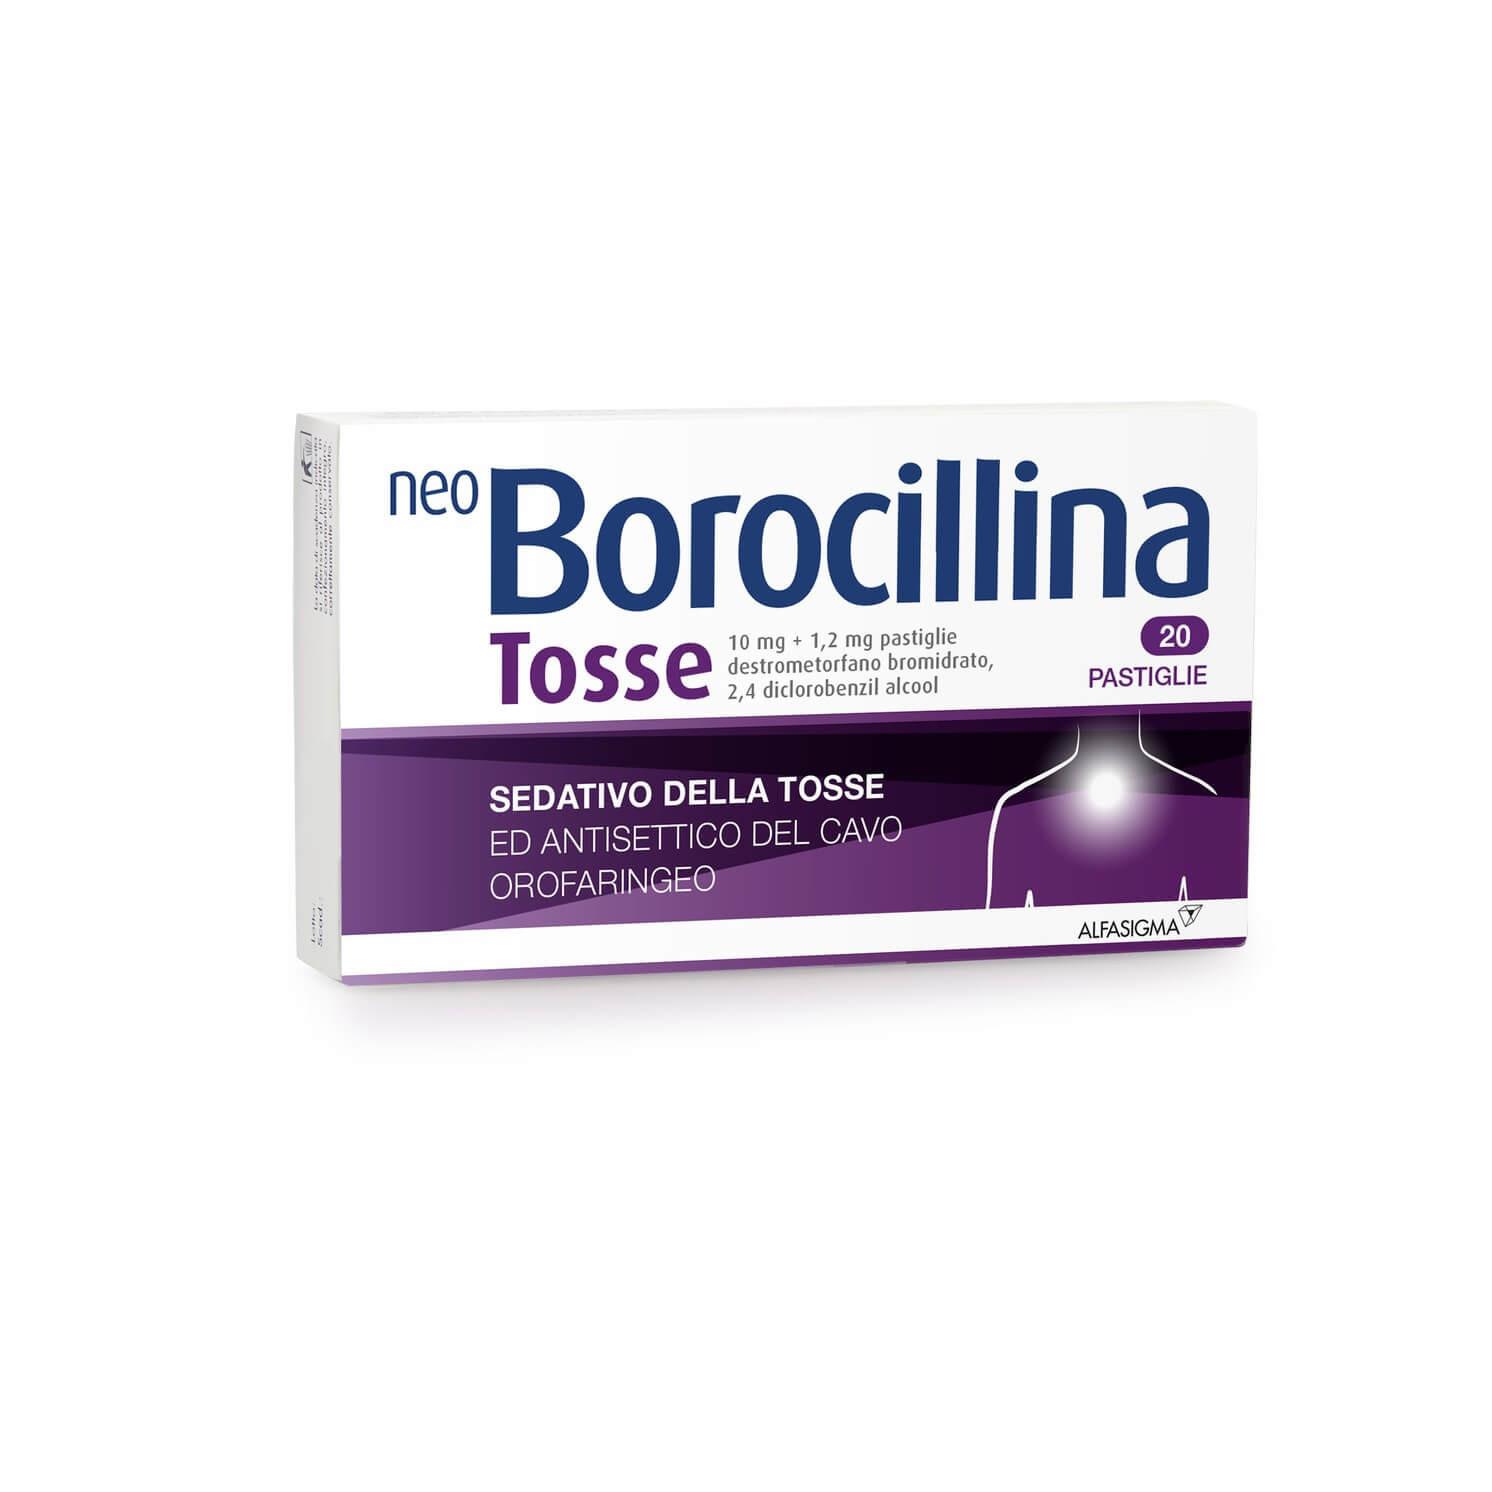 Neoborocillina Tosse 20 Pastiglie offerta